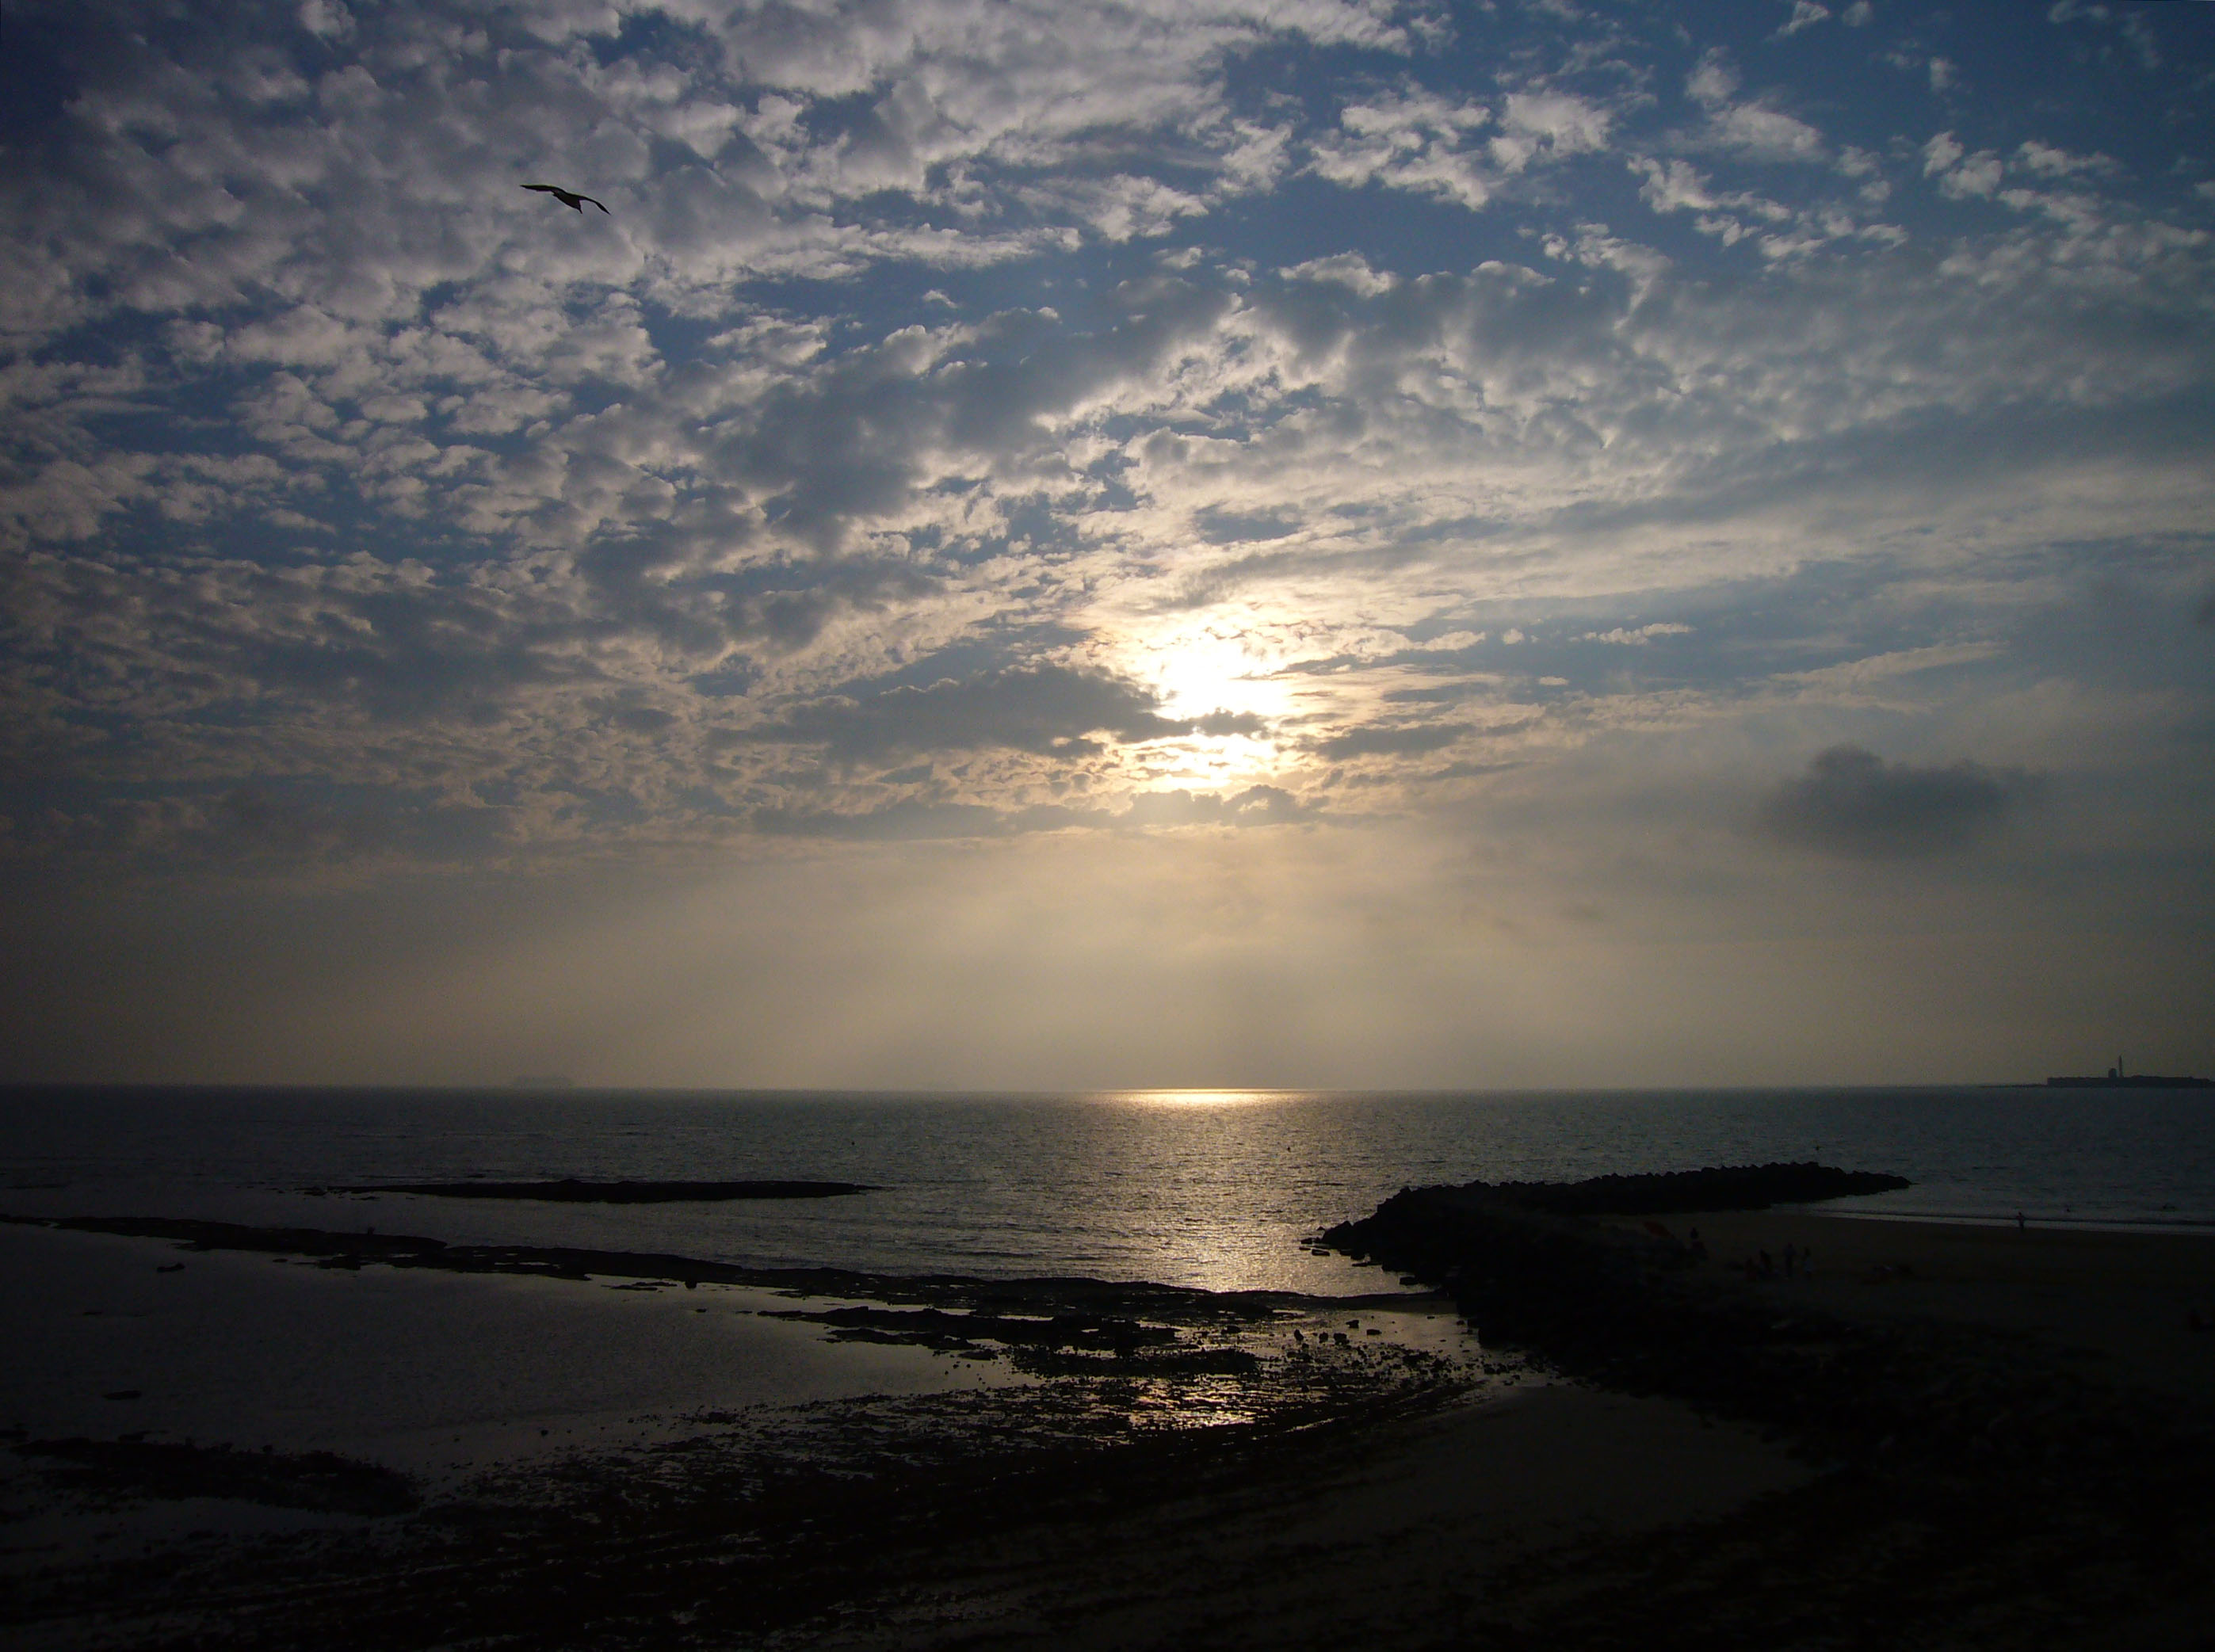 Playa Cortadura